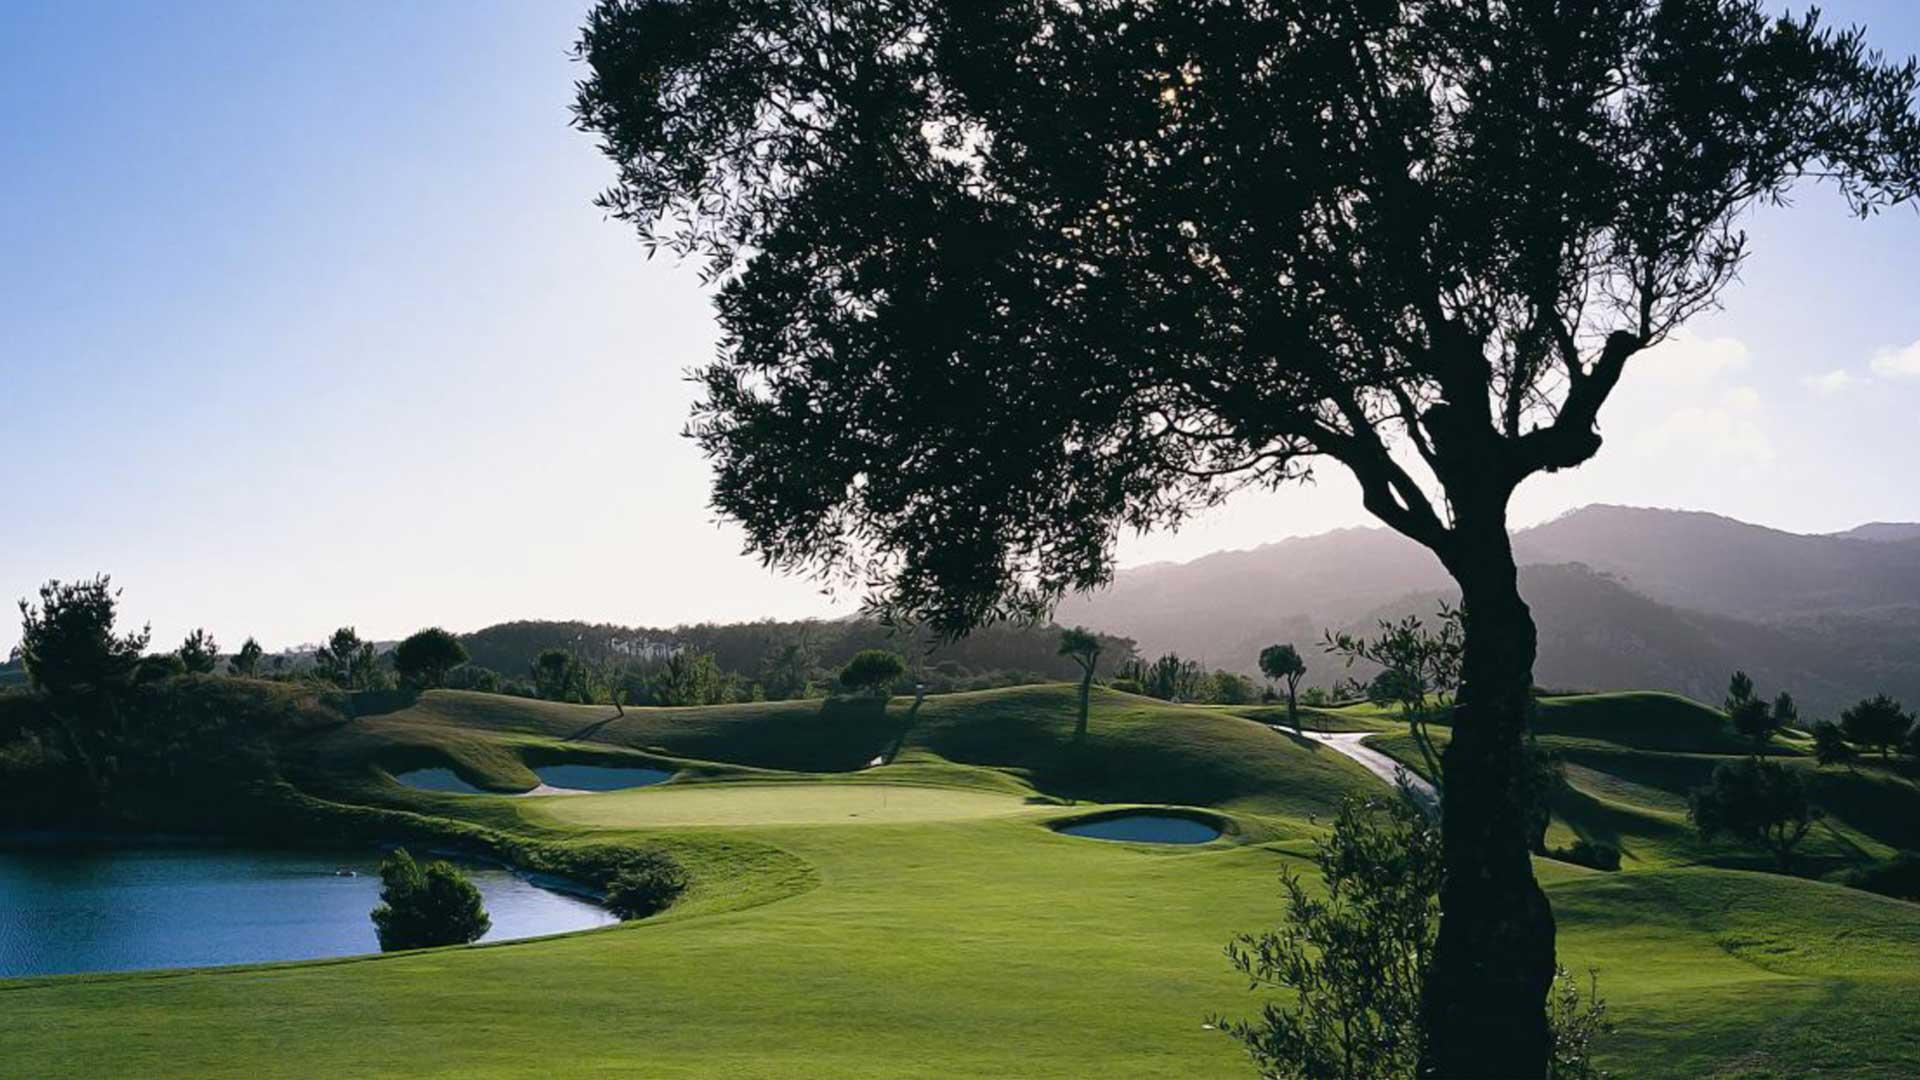 penha-longa-golf-course-0